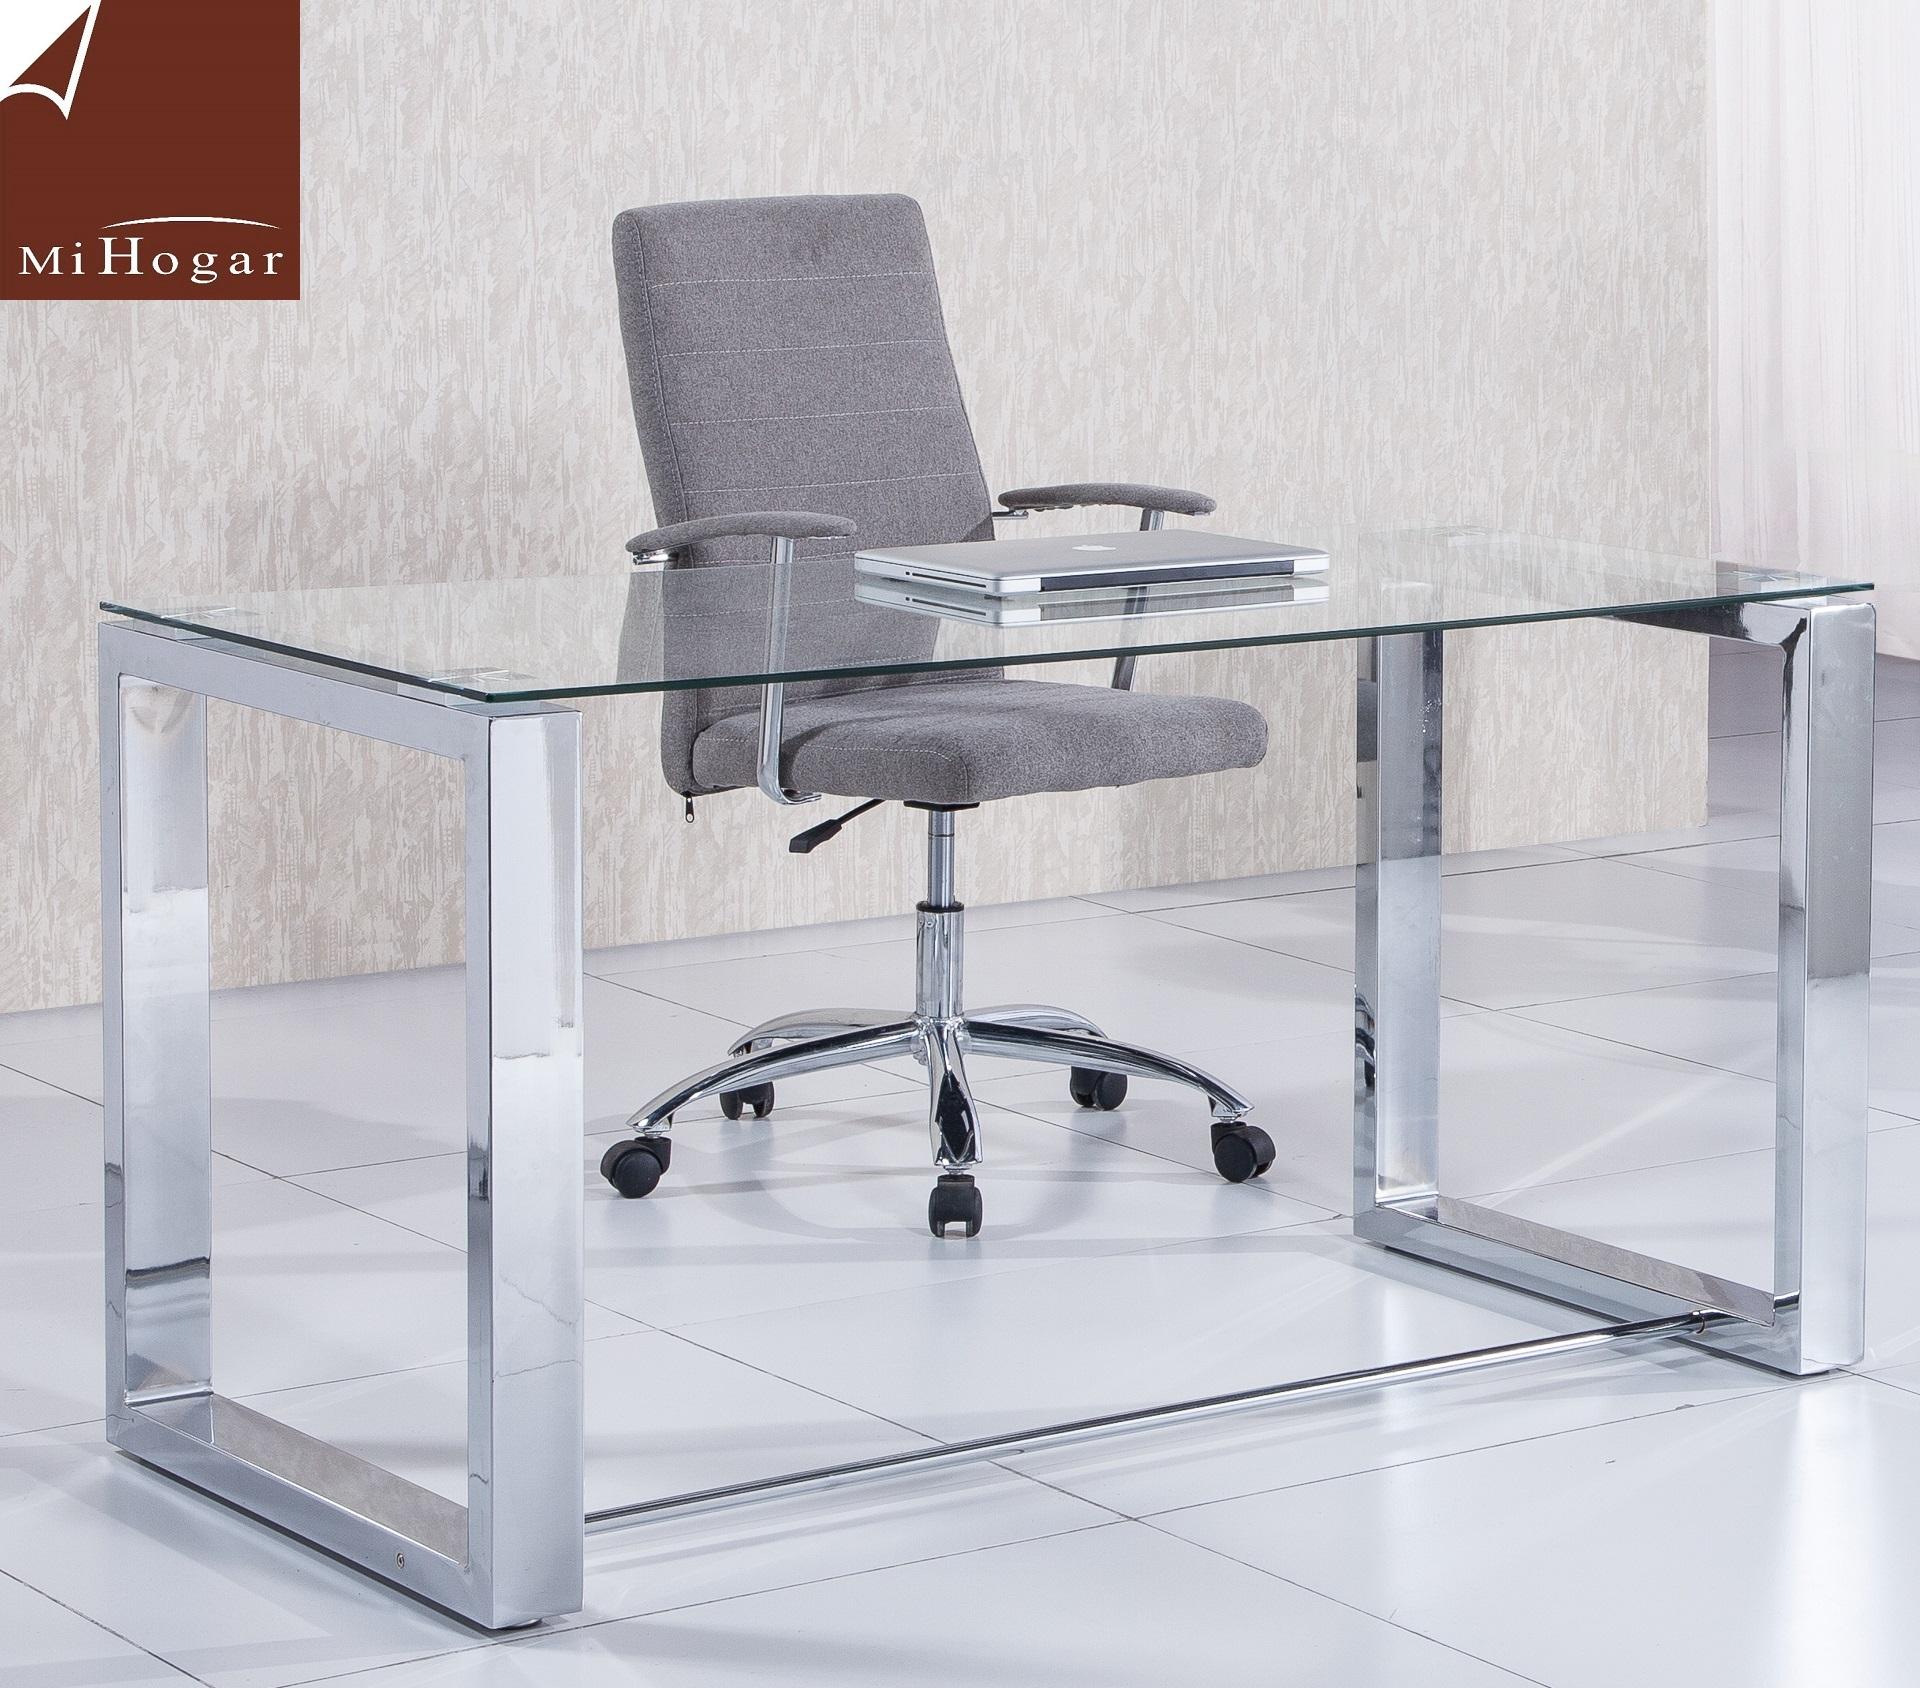 Mesa despacho cristal amsterdam muebles mi hogar for Mesa despacho ikea